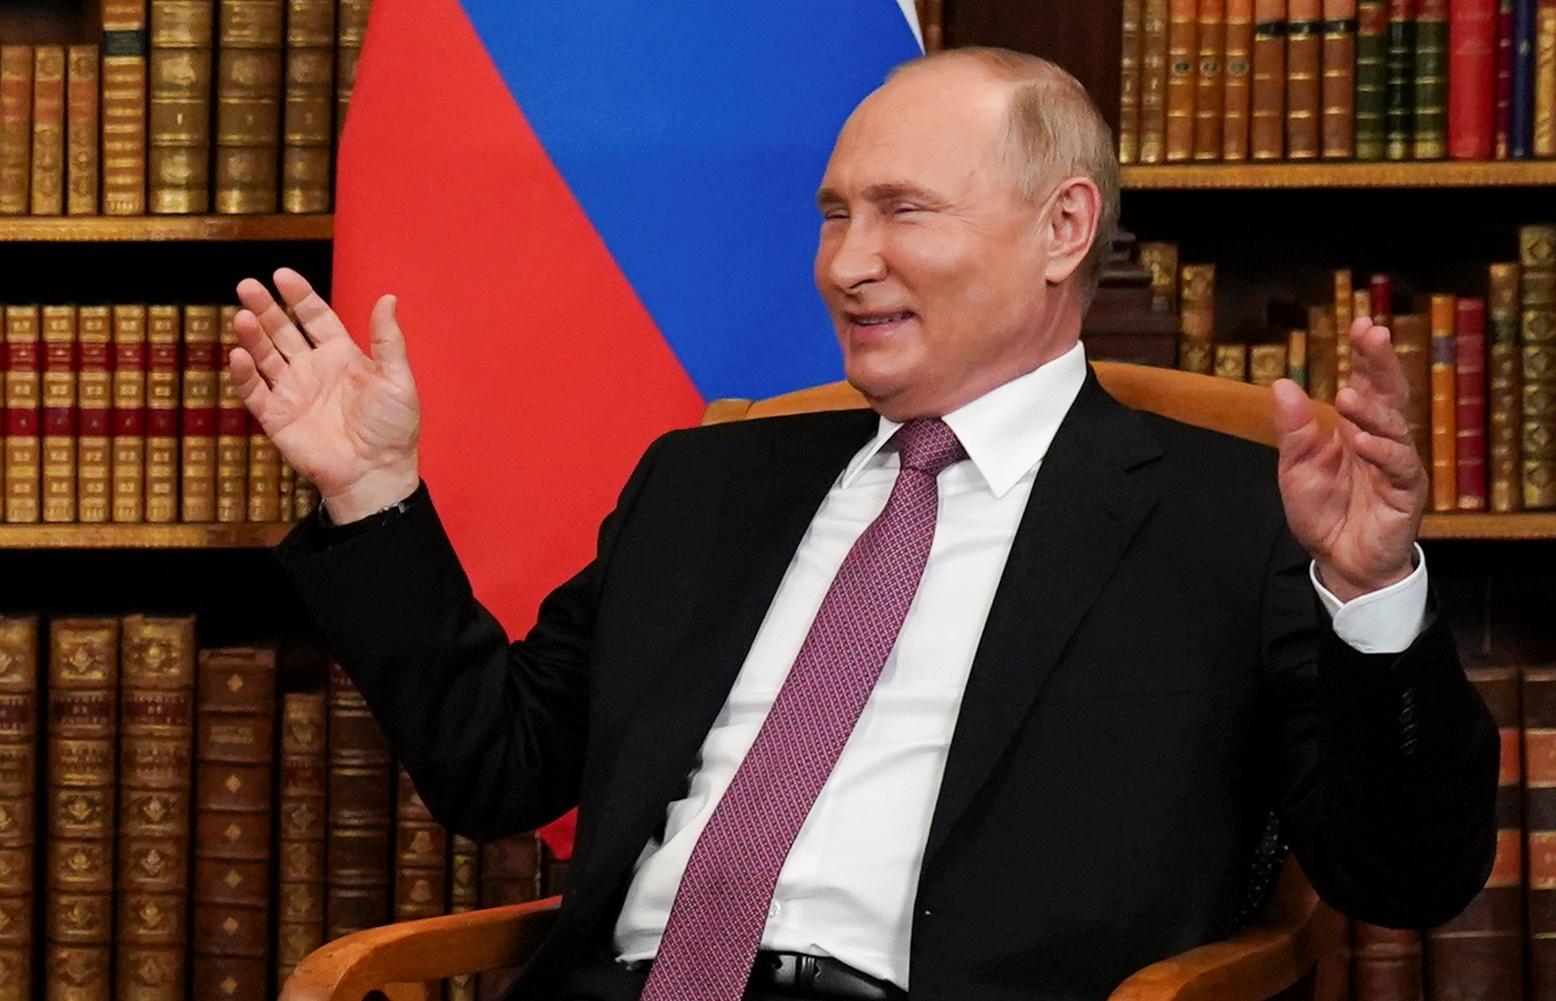 Russia's President Vladimir Putin reacts during the U.S.-Russia summit with U.S. President Joe Biden (not pictured) at Villa La Grange in Geneva, Switzerland, June 16, 2021. REUTERS/Kevin Lamarque